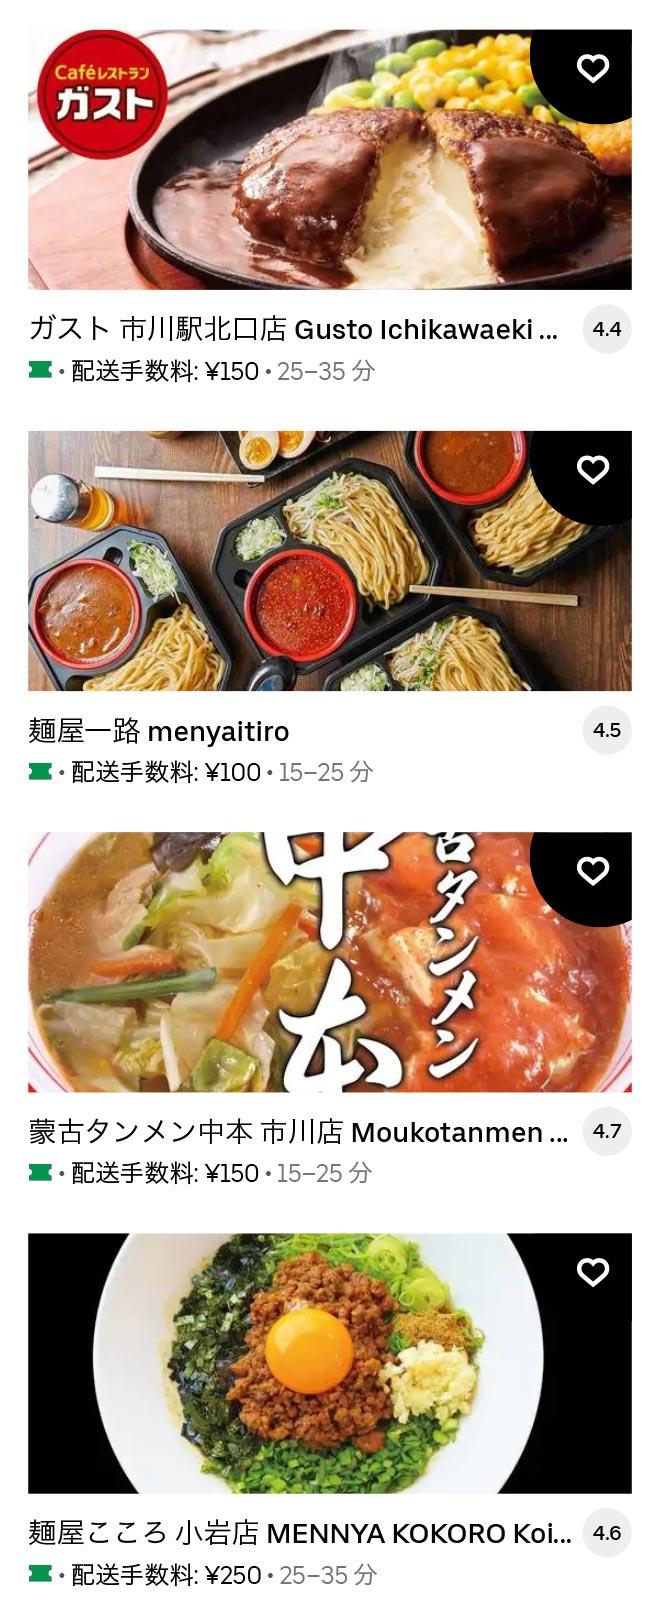 U ichikawa 2105 05